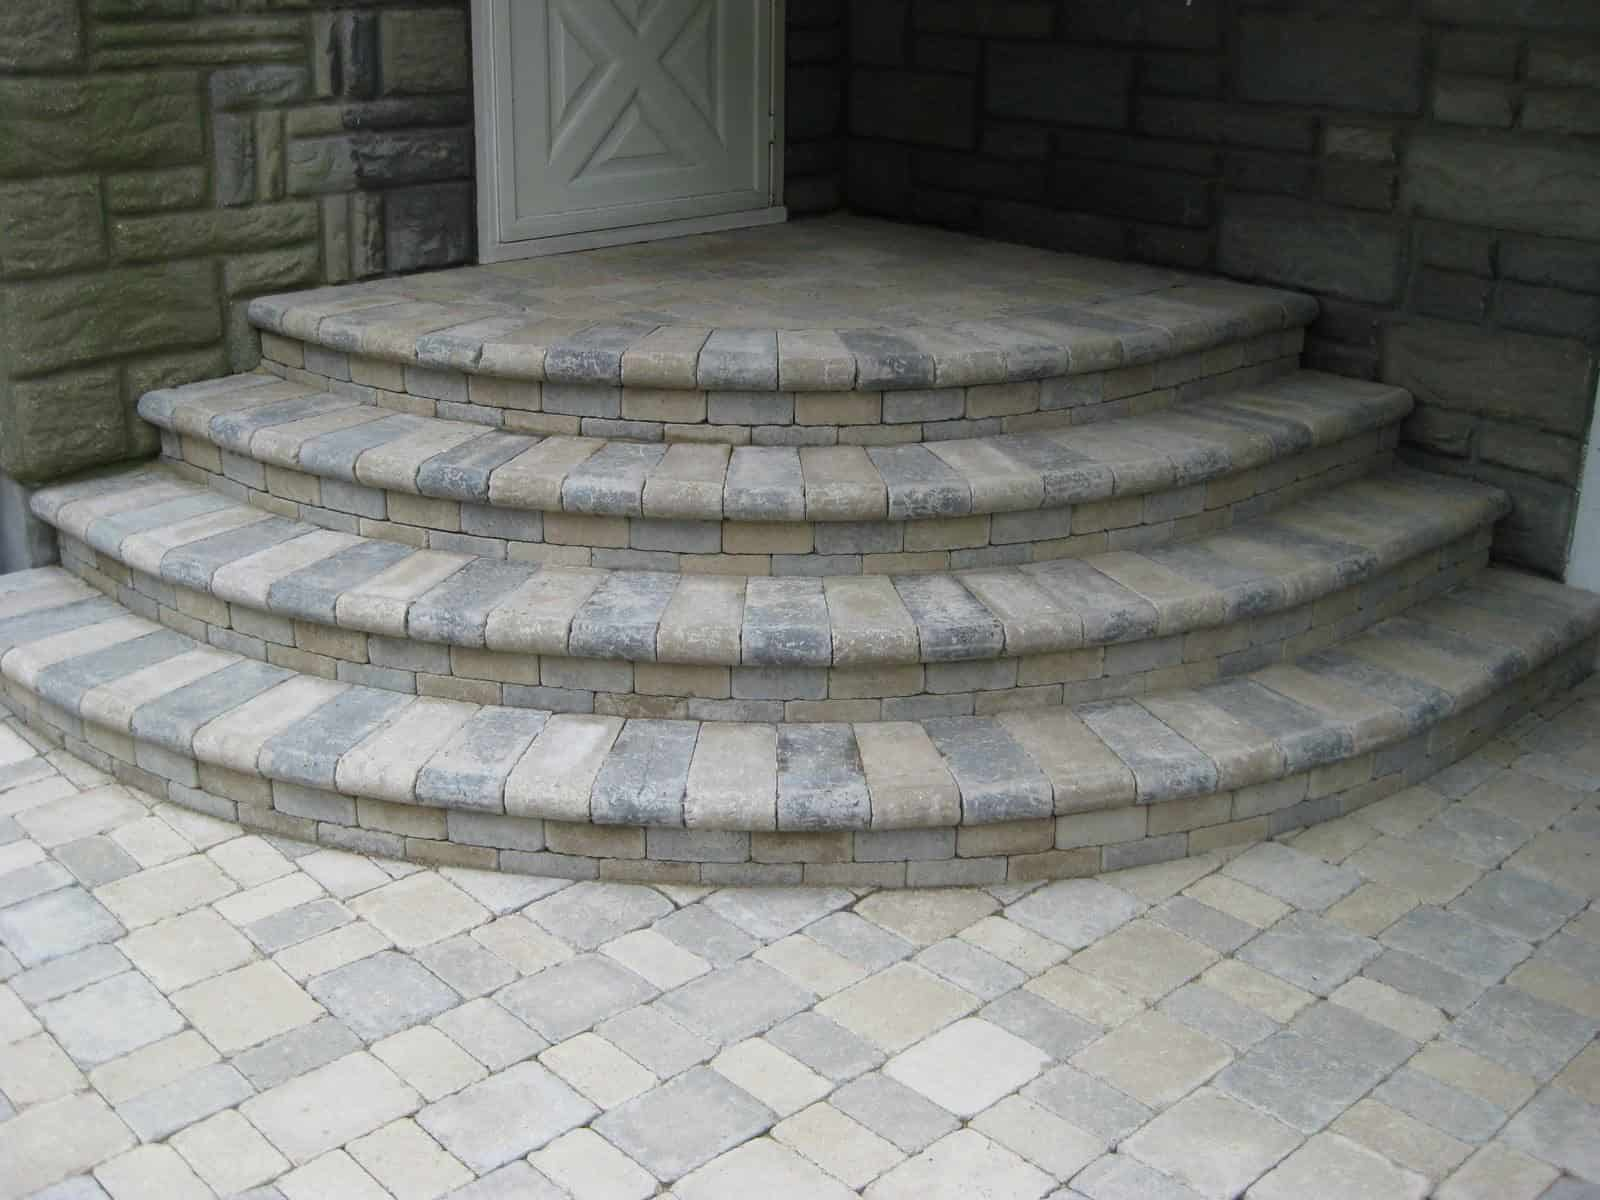 Paver Stoop - Unilock Tumbled Brussels Block Paver Stoop- Sandstone and Limestone Mix - Random Pattern - Huntington, Long Island NY